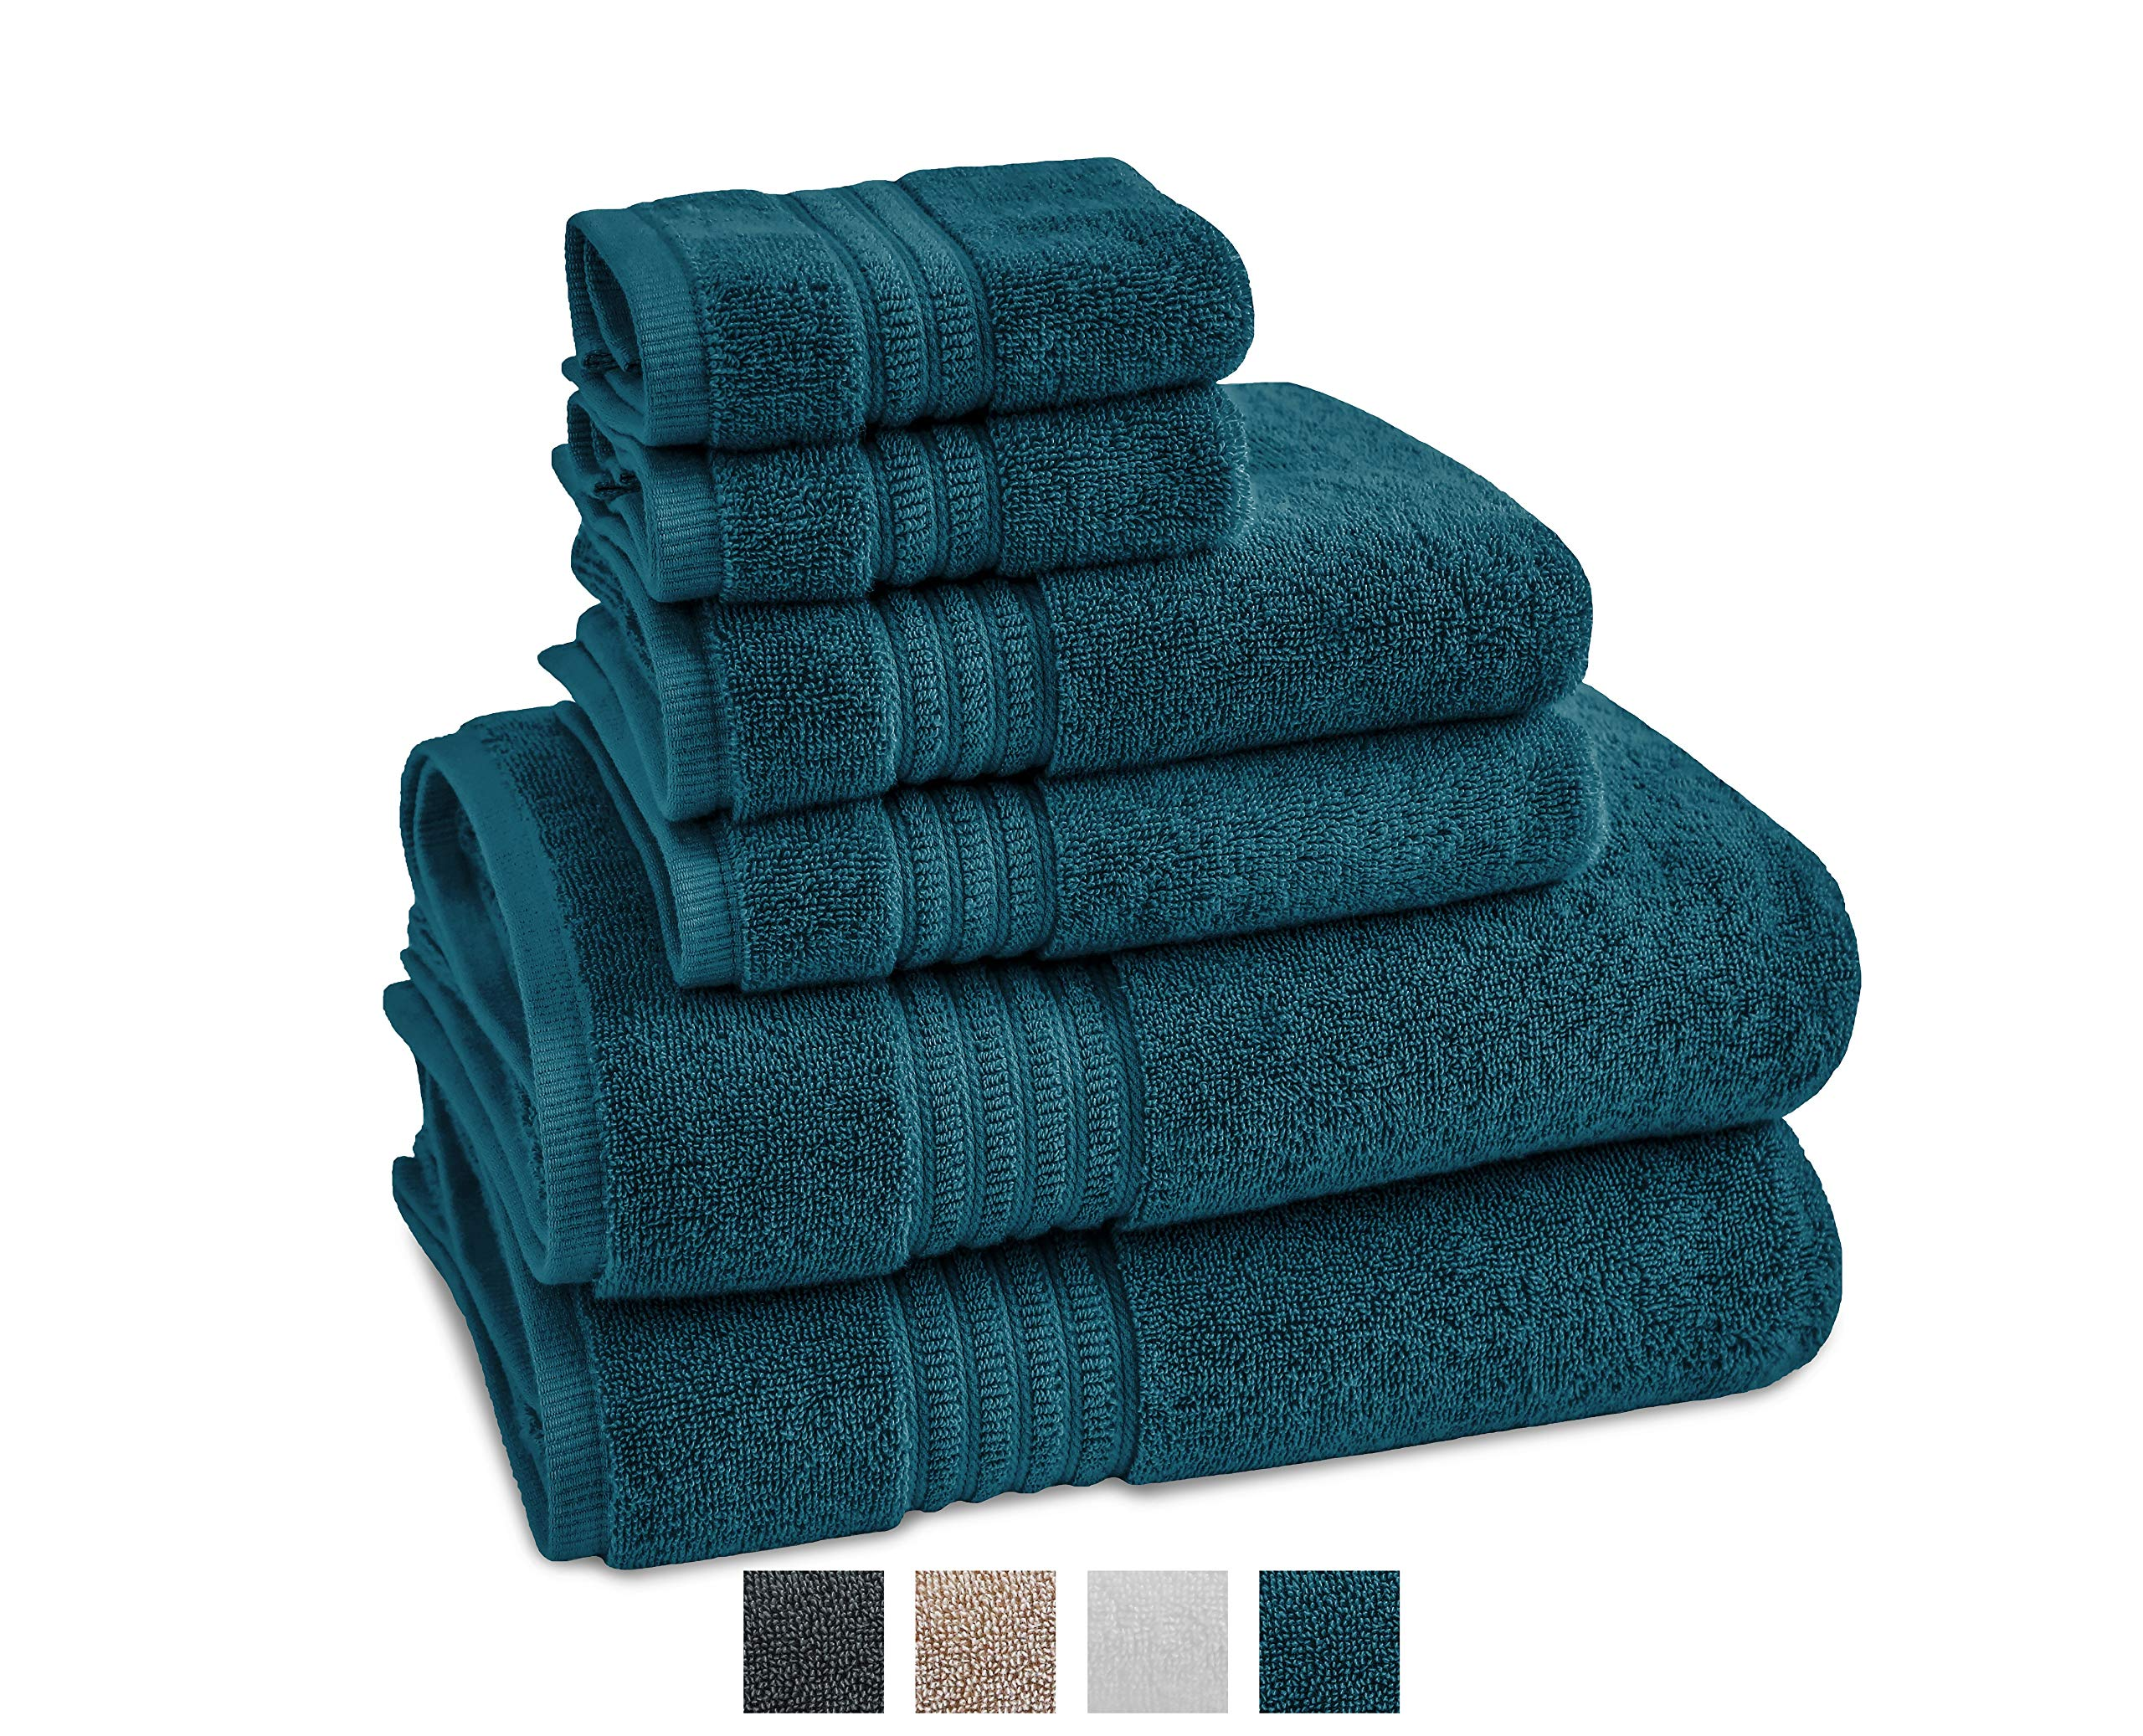 TRIDENT Large Bath Towels 100% Cotton, 6 Piece Set -2 Bath, 2 Hand, 2 Washcloths, Soft, Absorbent, Machine Washable, Air Rich Yarn, Soft Comfort Towels (Peacock)